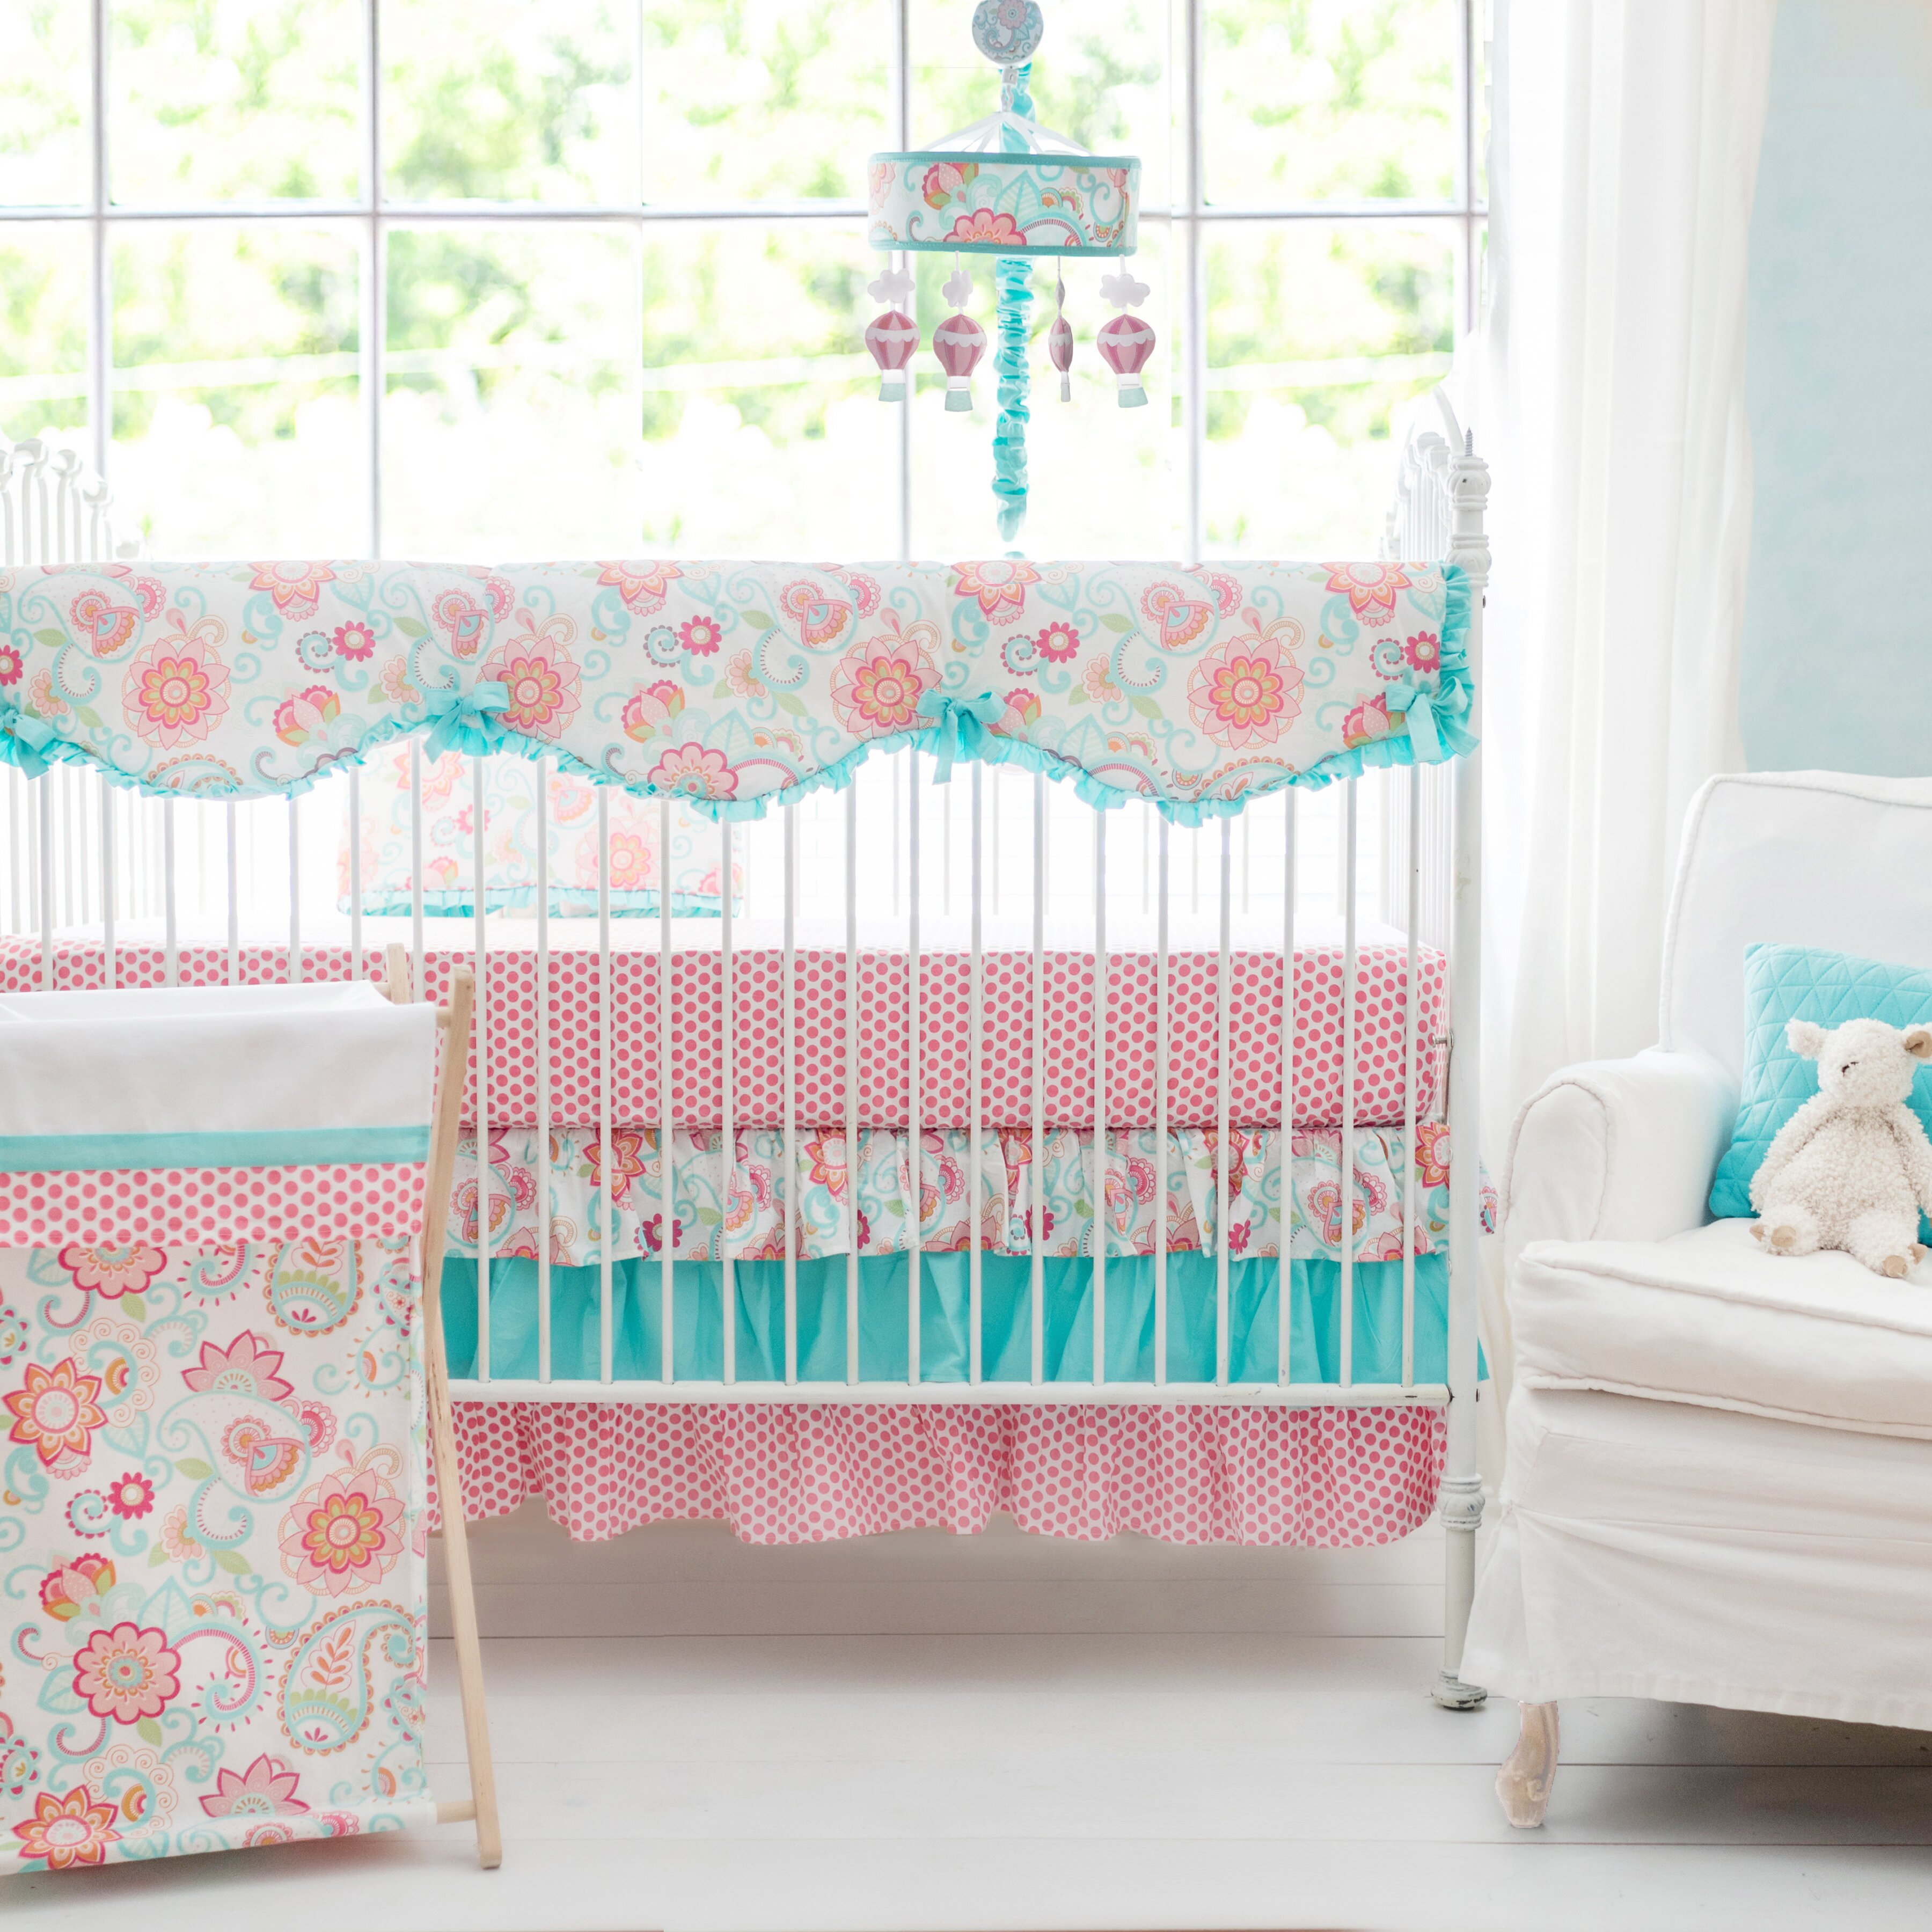 Crib protector for babies - My Baby Sam Gypsy Baby Crib Rail Cover